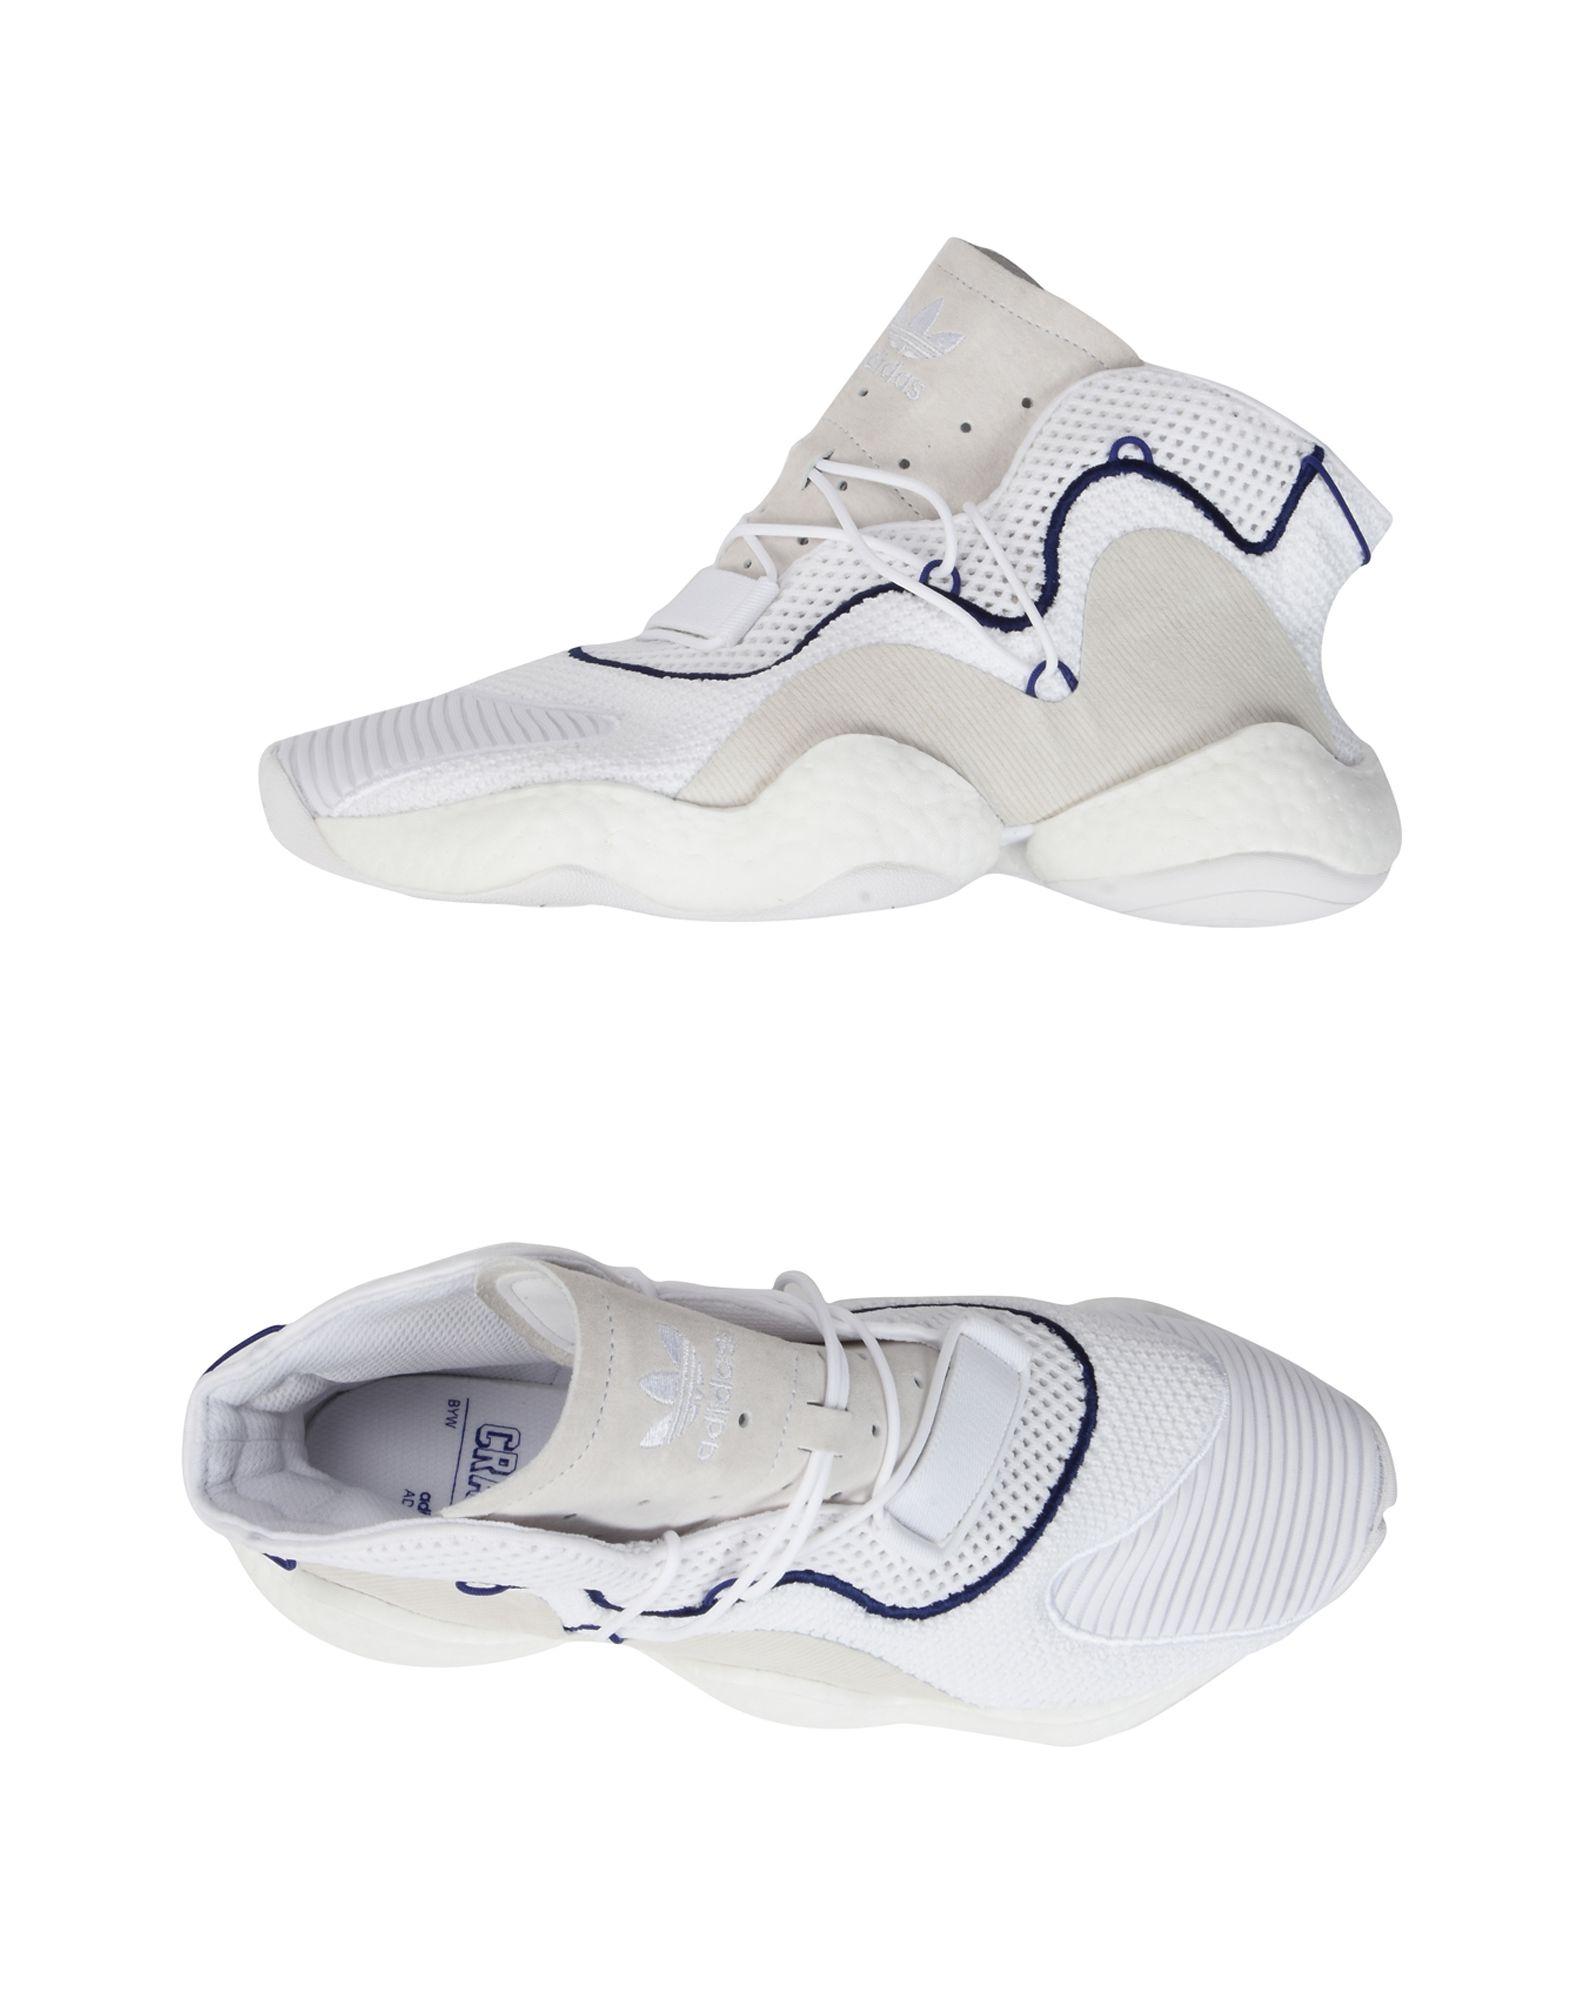 Scarpe da Byw Ginnastica Adidas Originals Crazy Byw da Lvl 1 - Uomo - 11446495PB 568f85